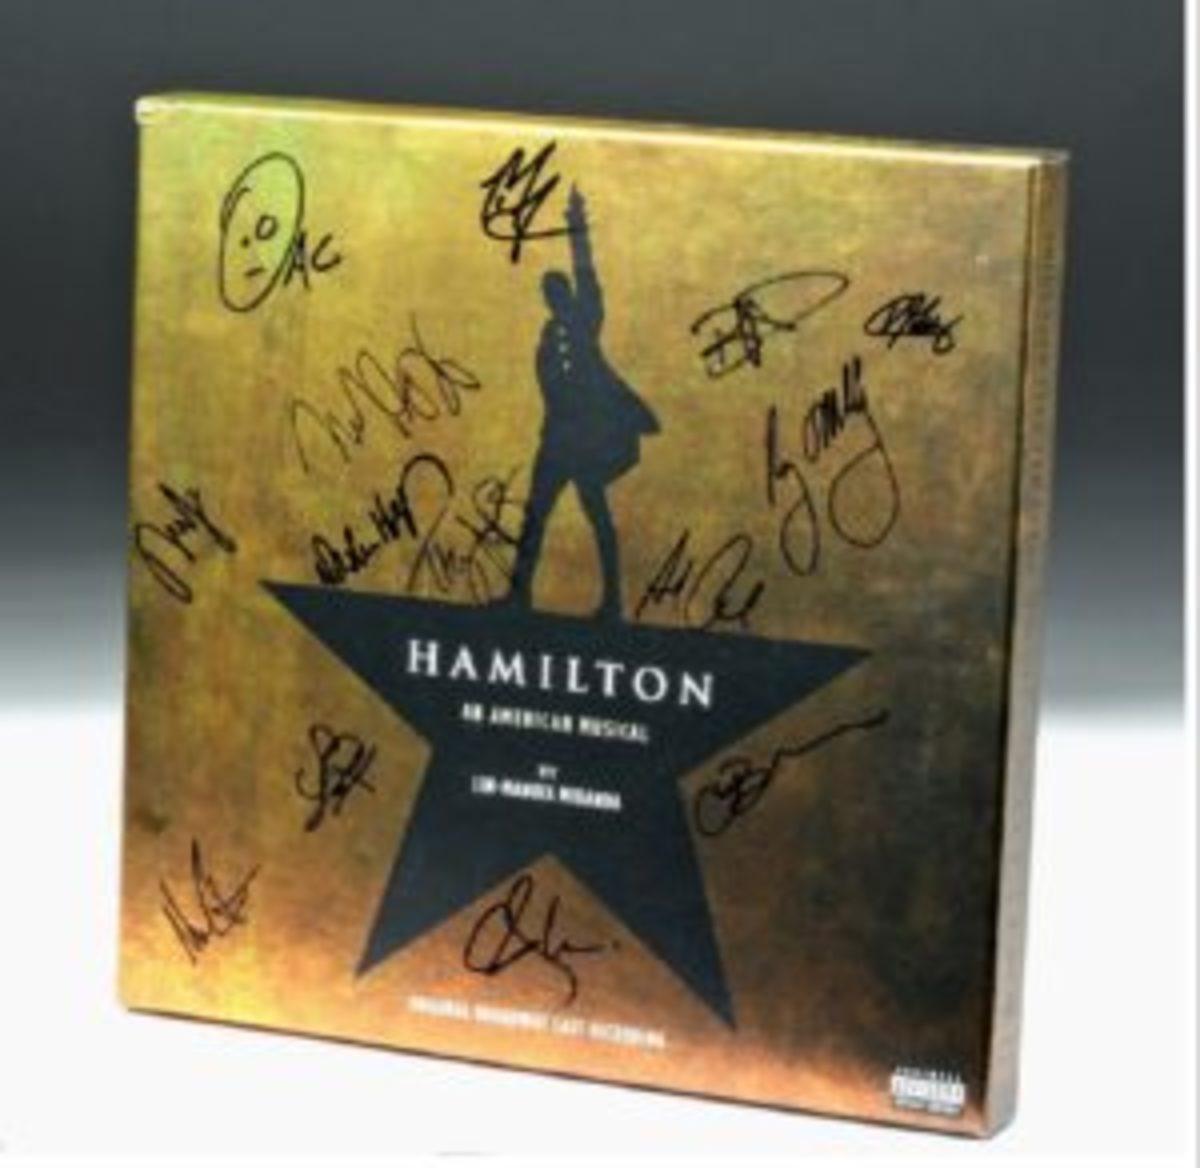 Hamilton LP recording signed